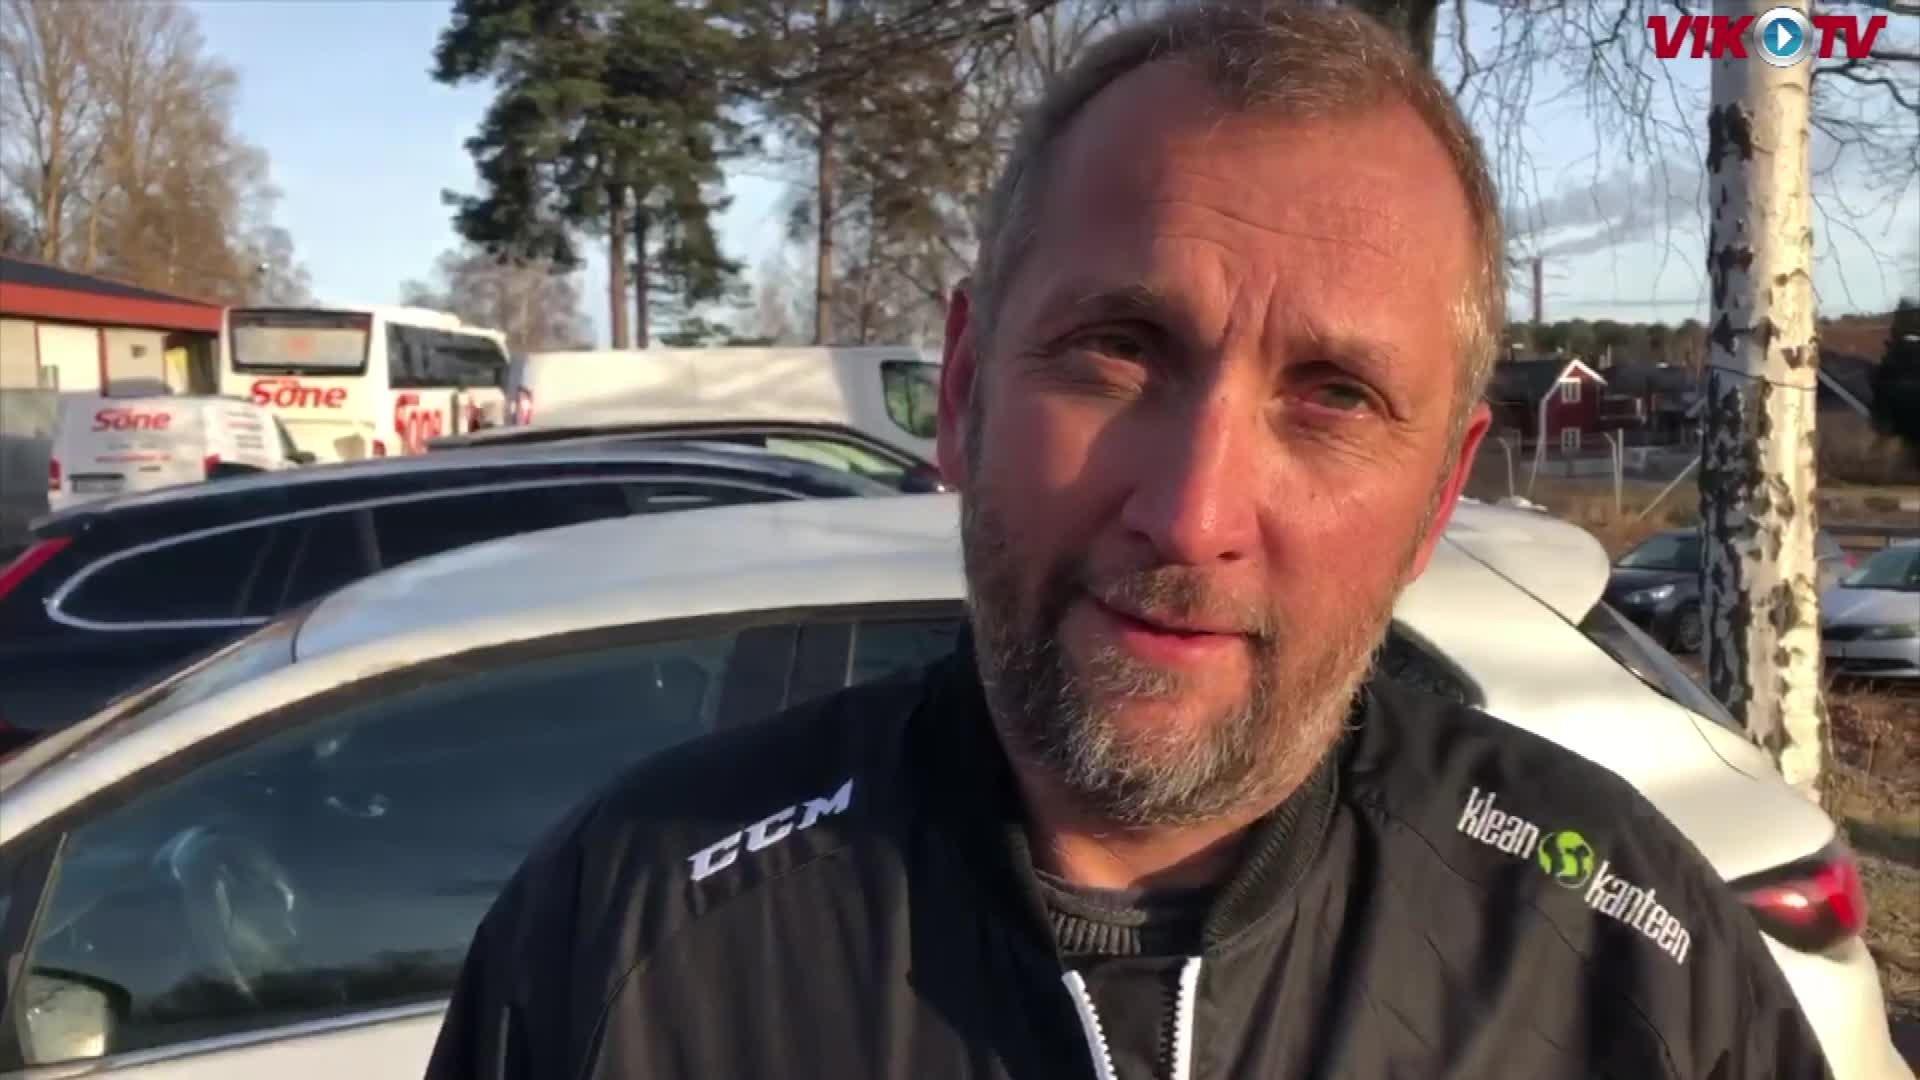 VIK-TV: Intervju Mikael Johansson före BIK Karlskoga borta